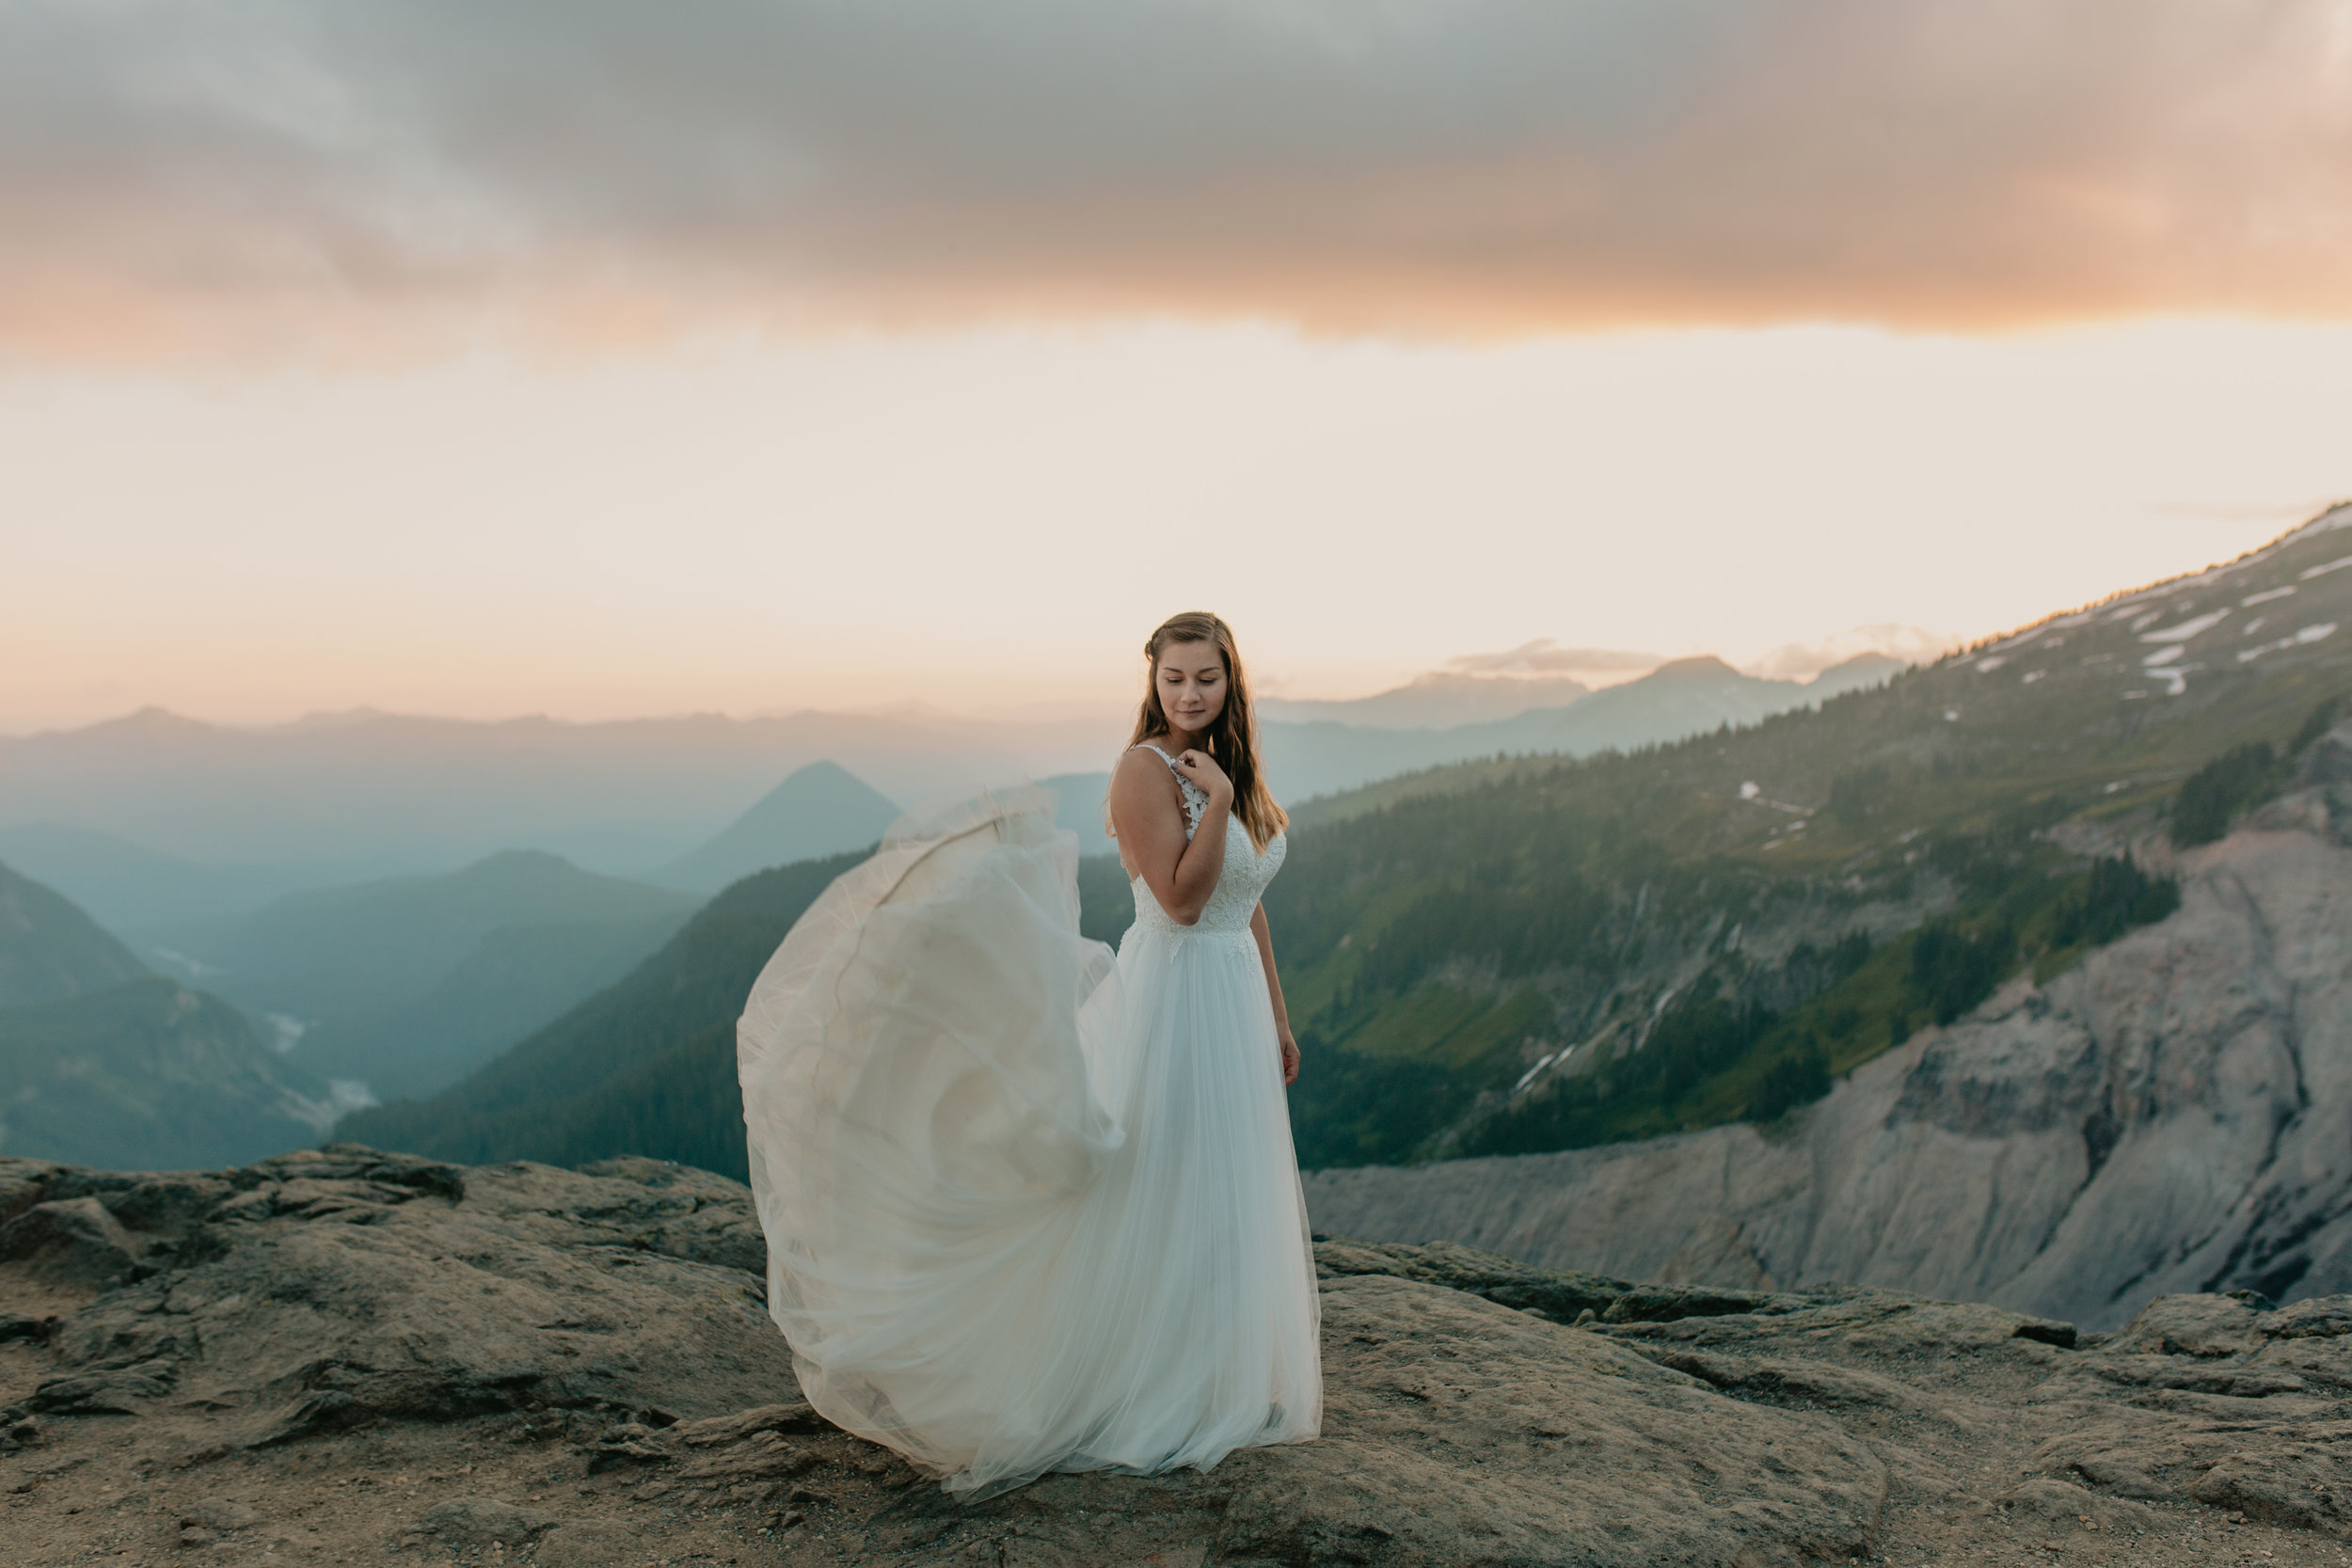 Nicole-Daacke-Photography-Mt-Rainier-elopement-photographer-washington-mountain-epic-wedding-photography-wildflowers-at-rainier-pine-tree-cloudy-summer-day-at-mountain-rainier-51.jpg